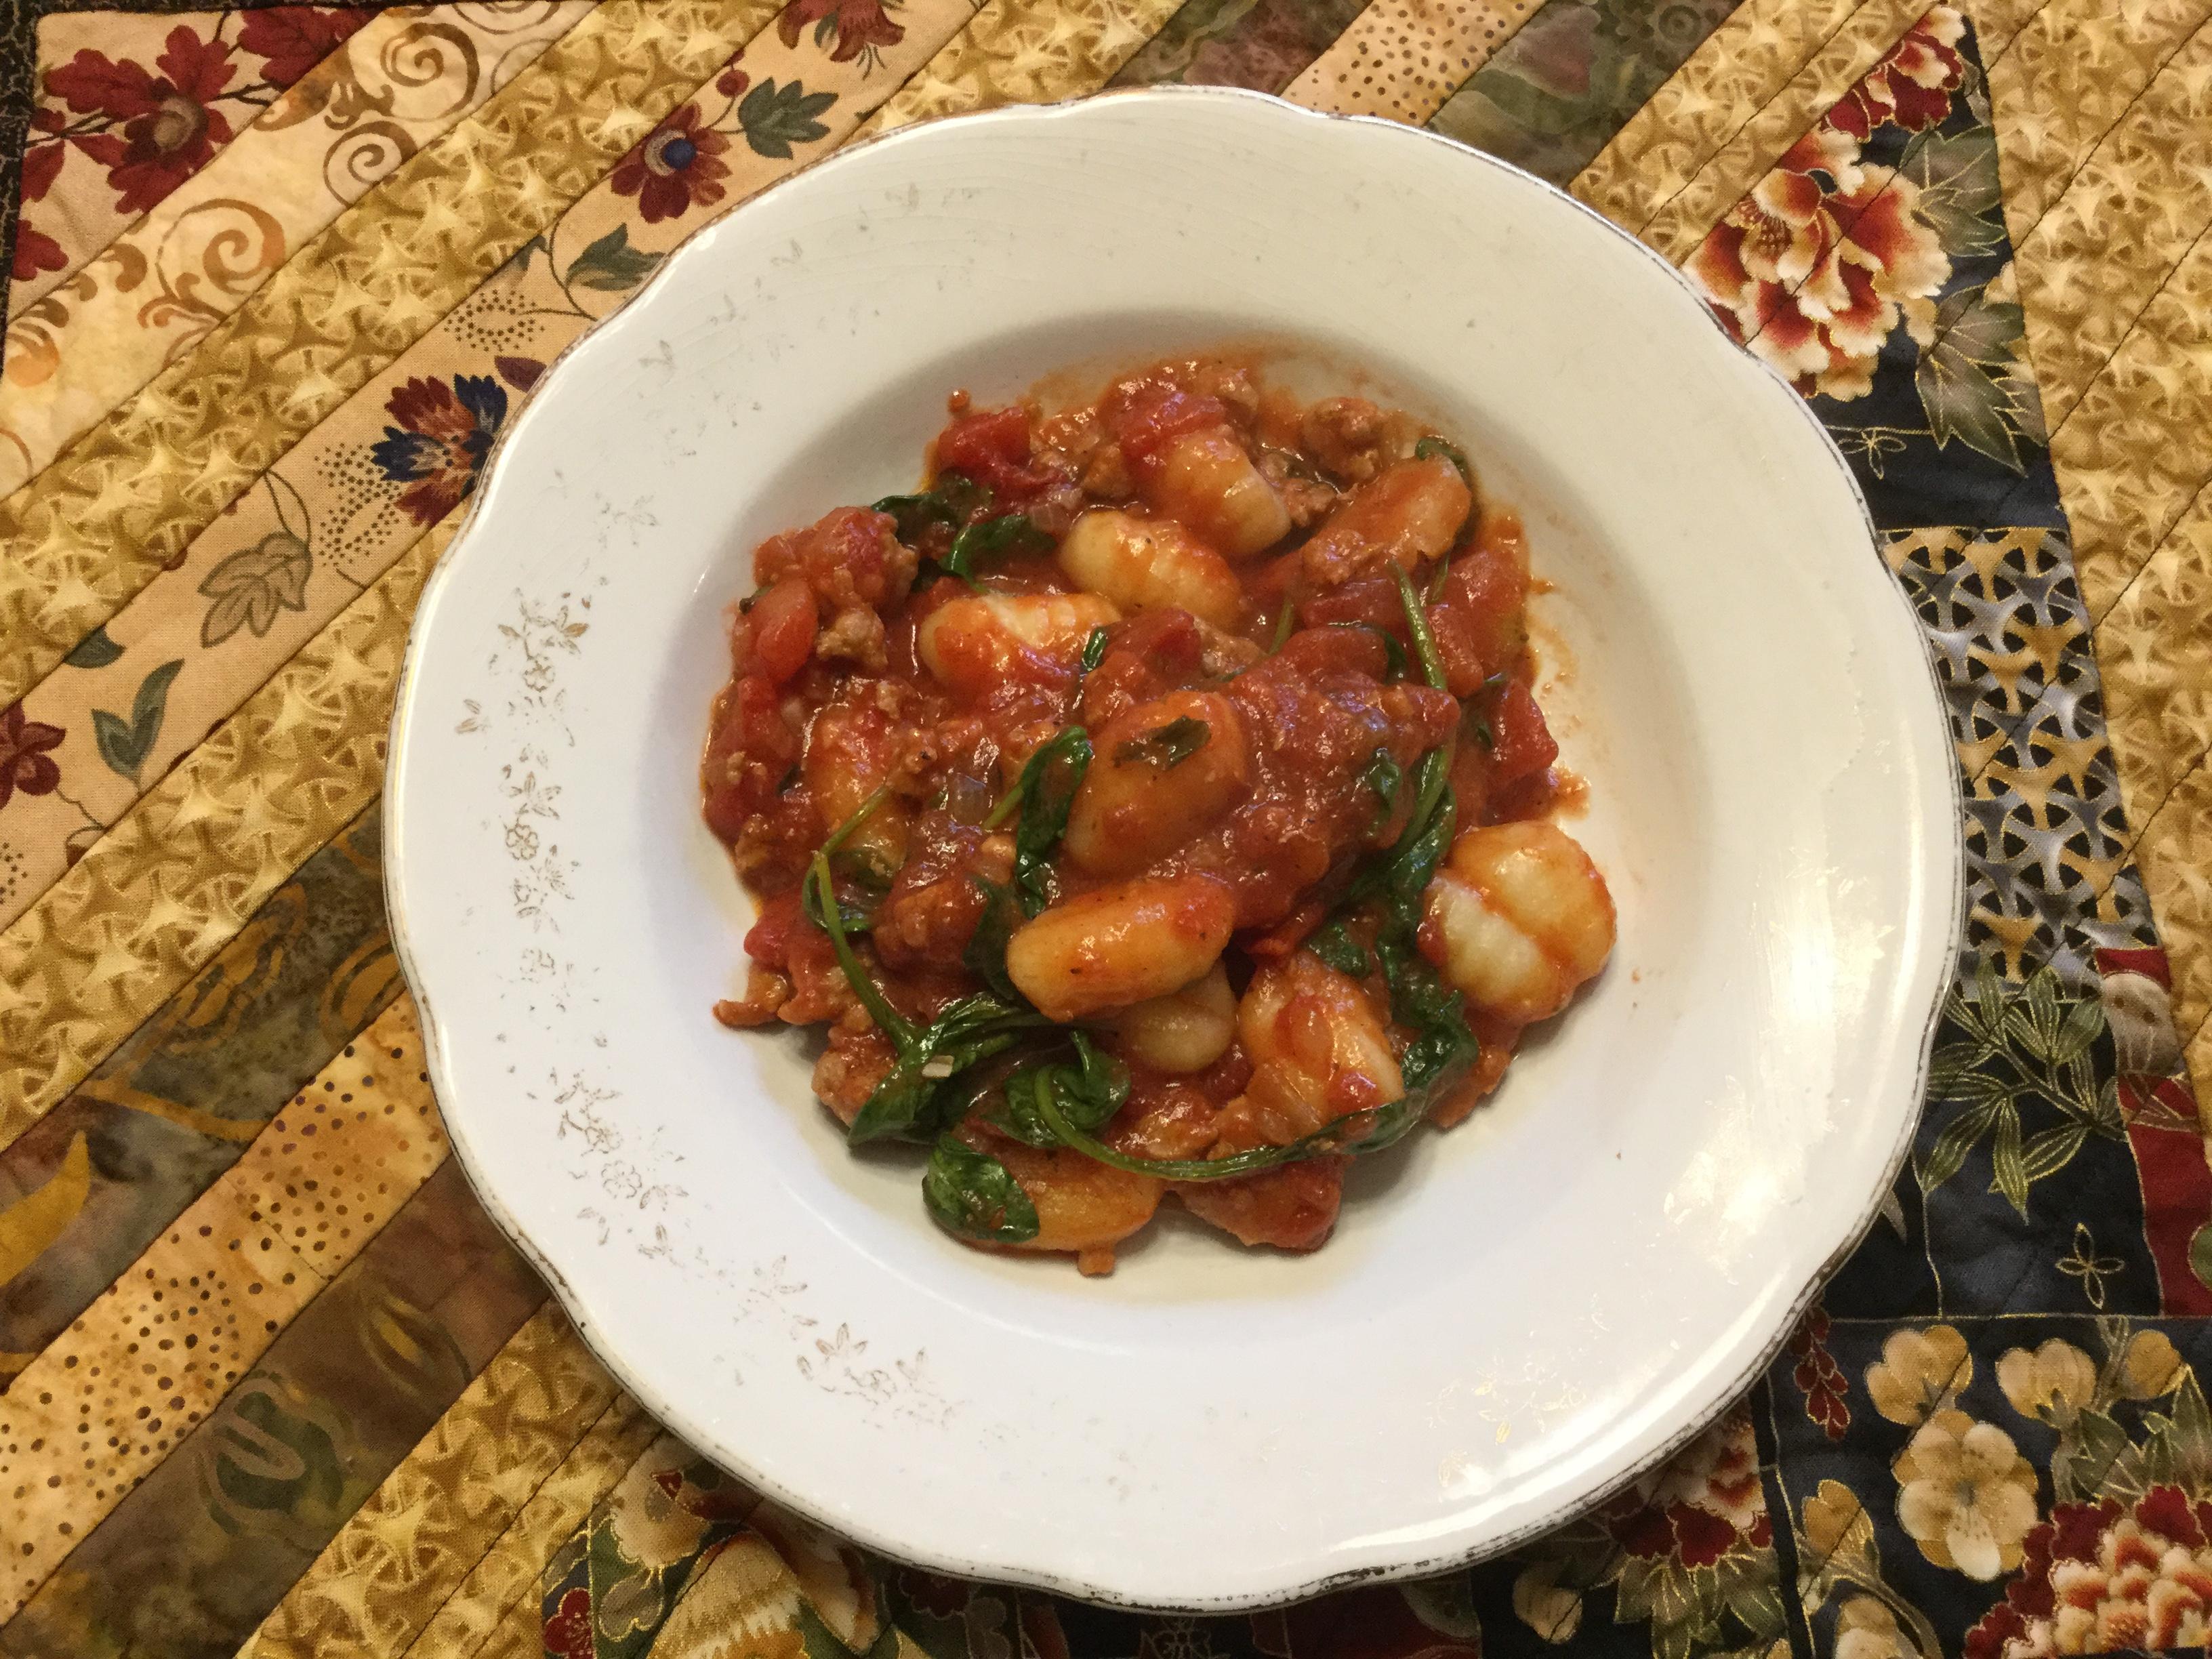 Italian Sausage and Gnocchi Skillet